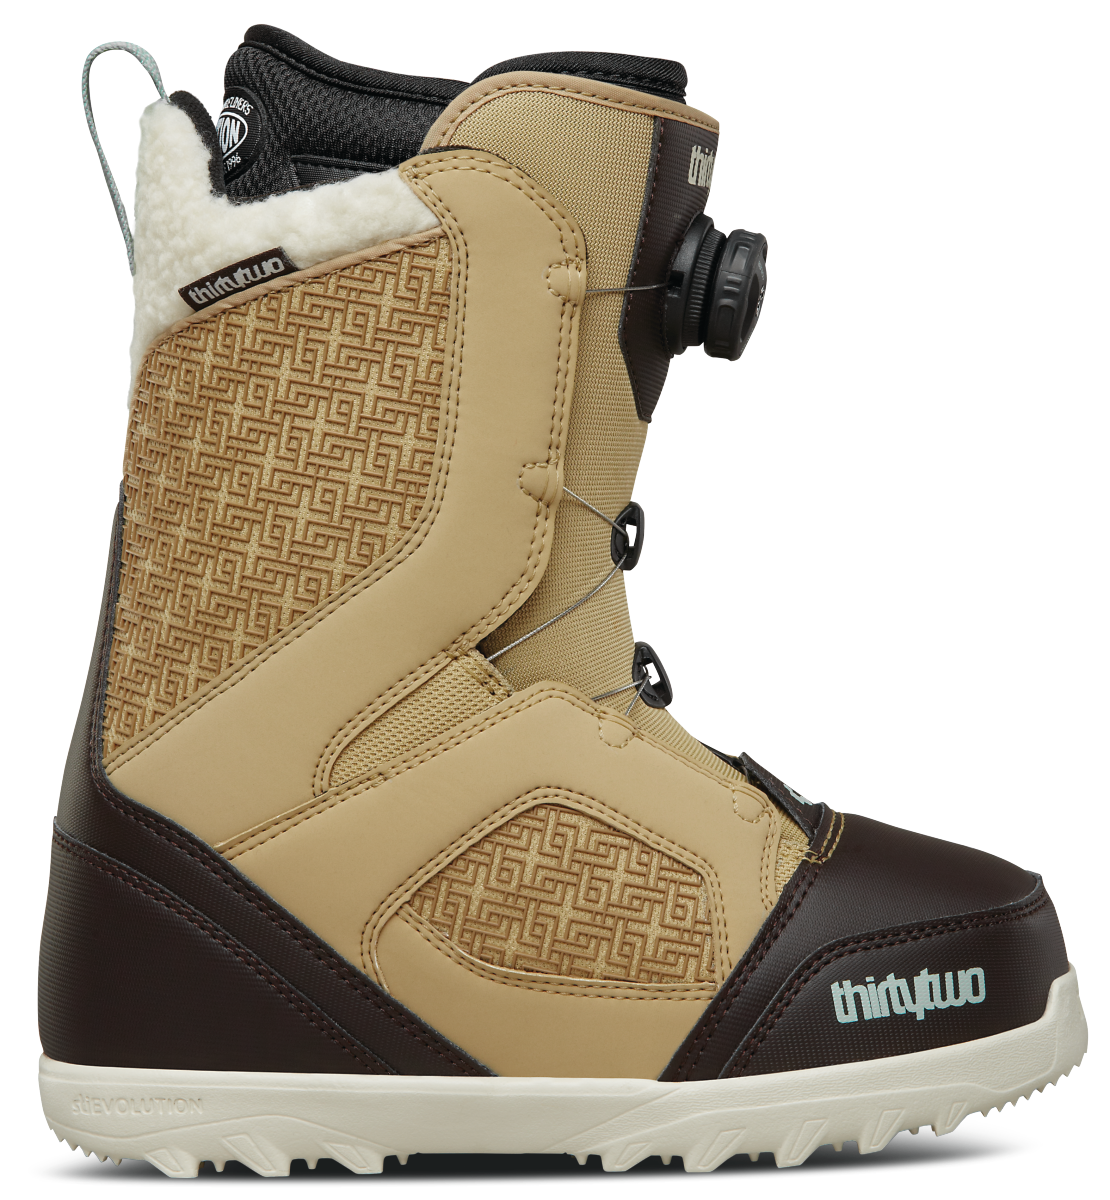 Thirtytwo Women S Stw Boa Snowboard Boots Tan Black 2018 Snowboard Boots Boots Womens Boots